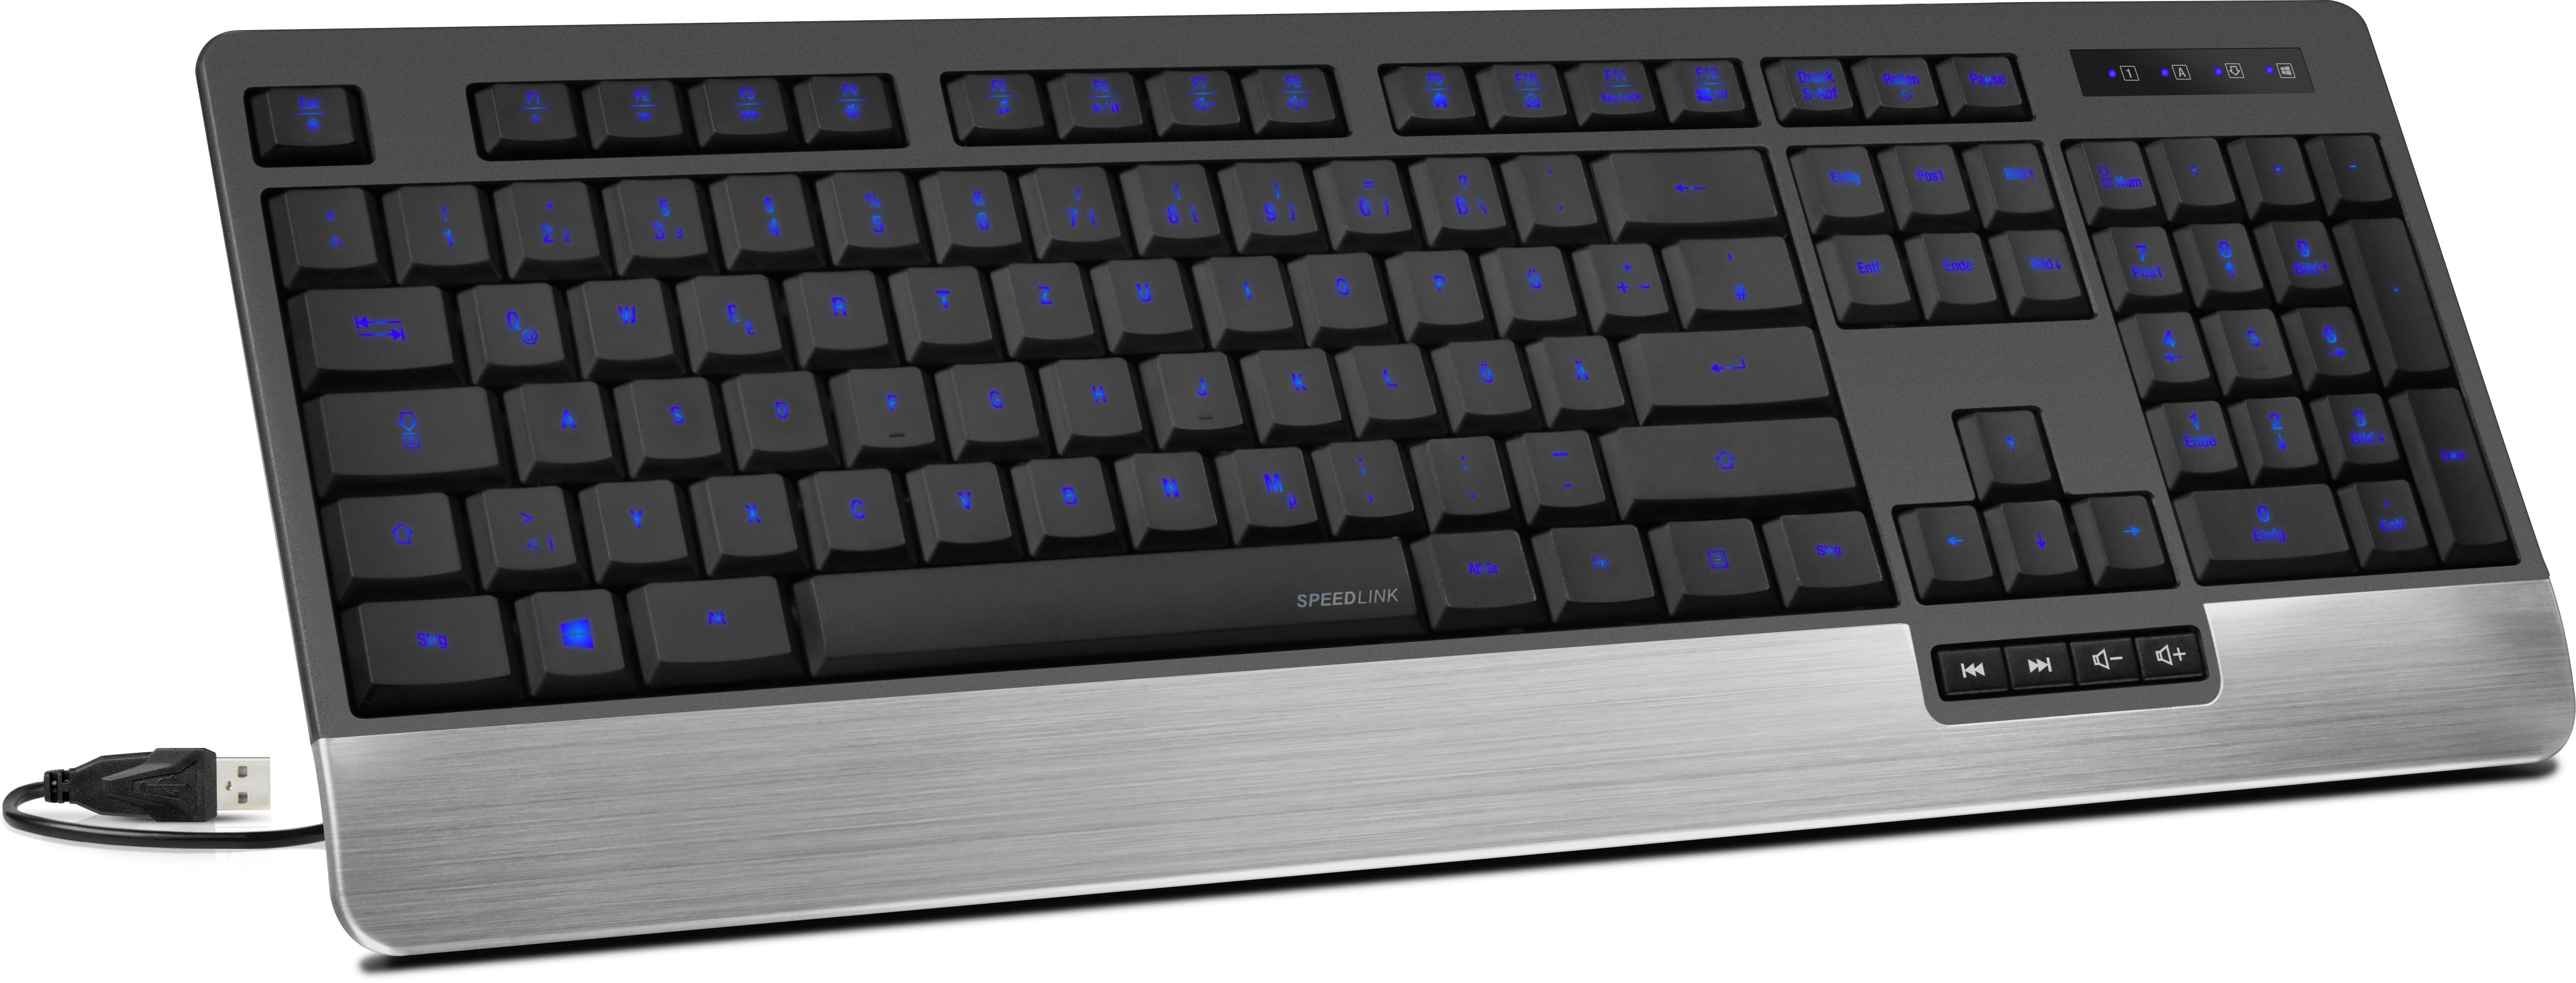 Speedlink klaviatuur Lucidis Illuminated..